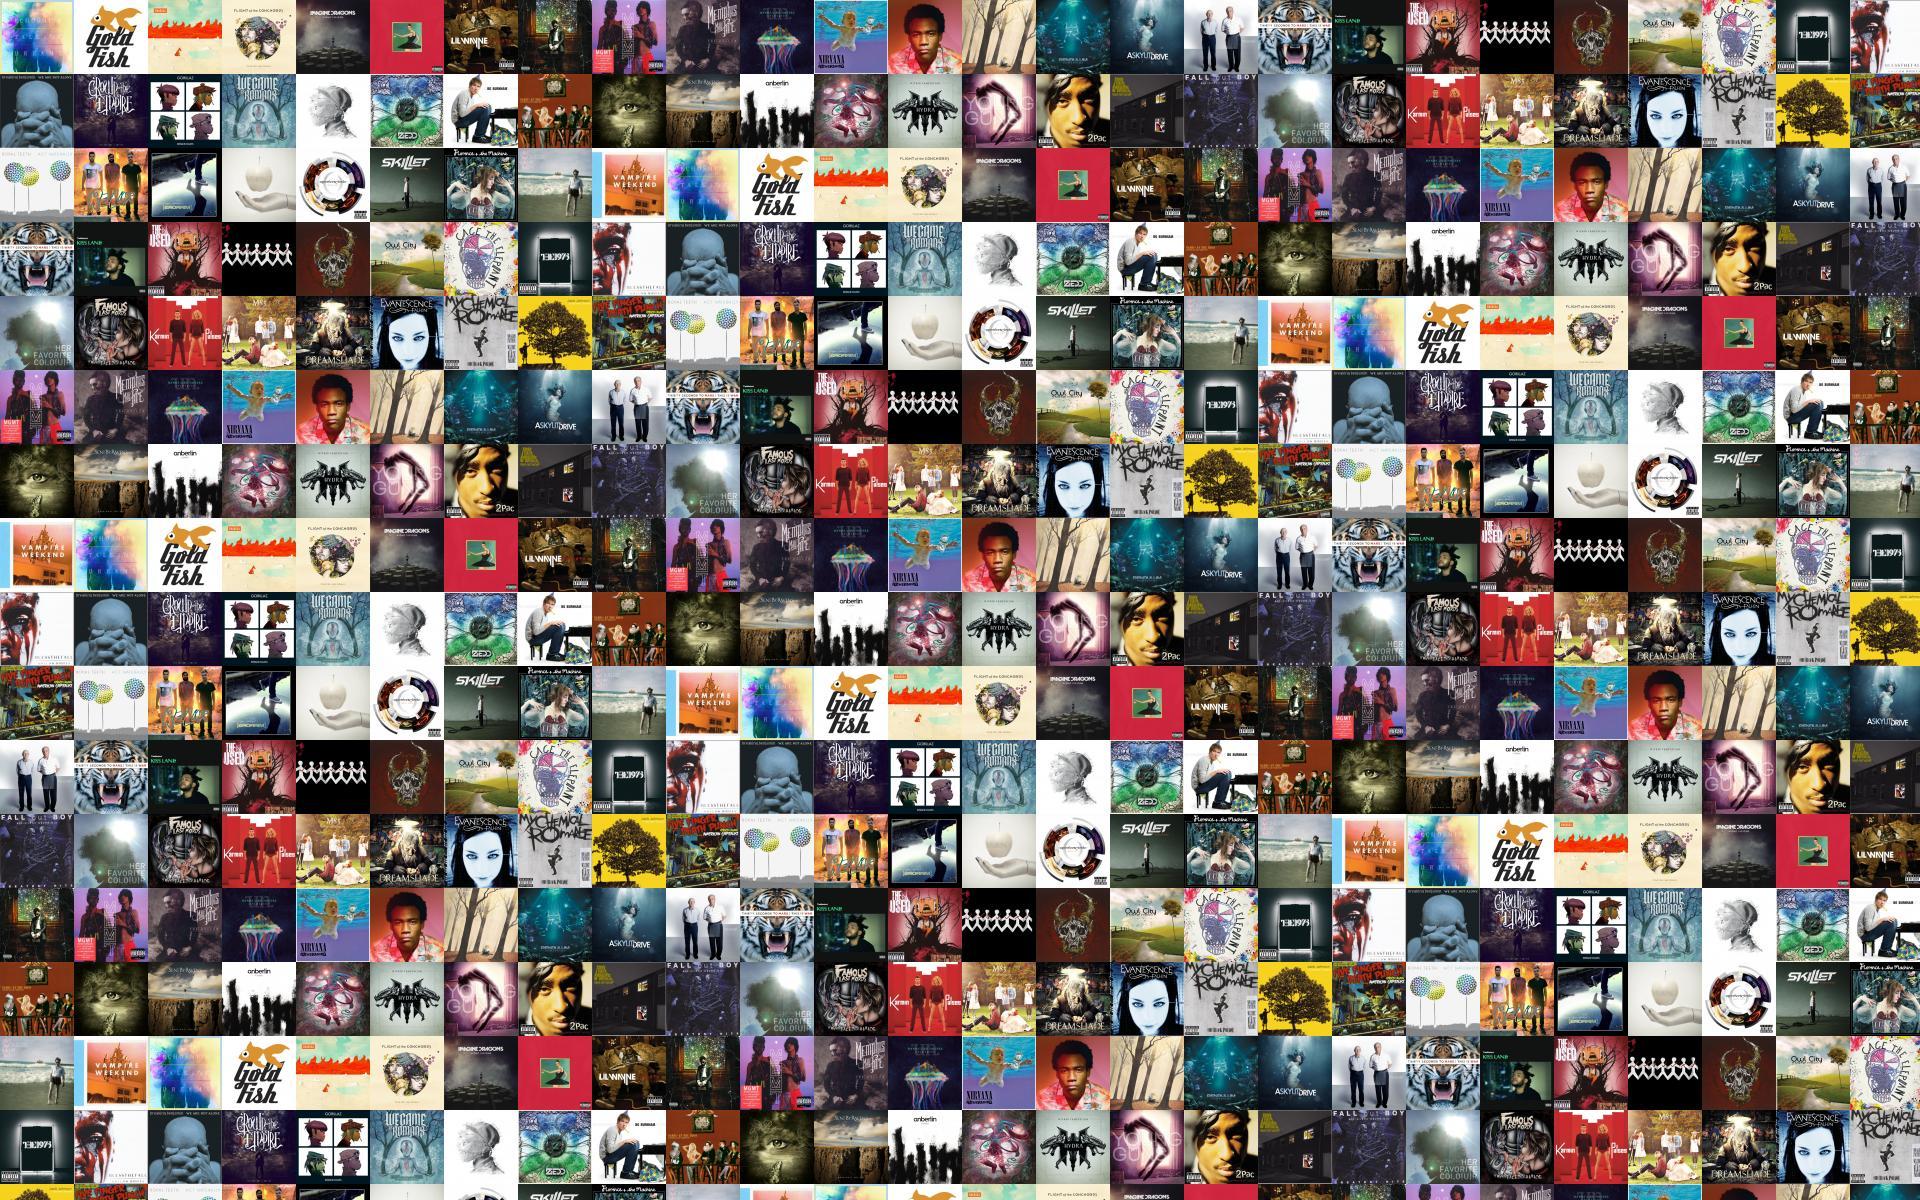 Flight Of The Conchords Tiled Desktop Wallpaper